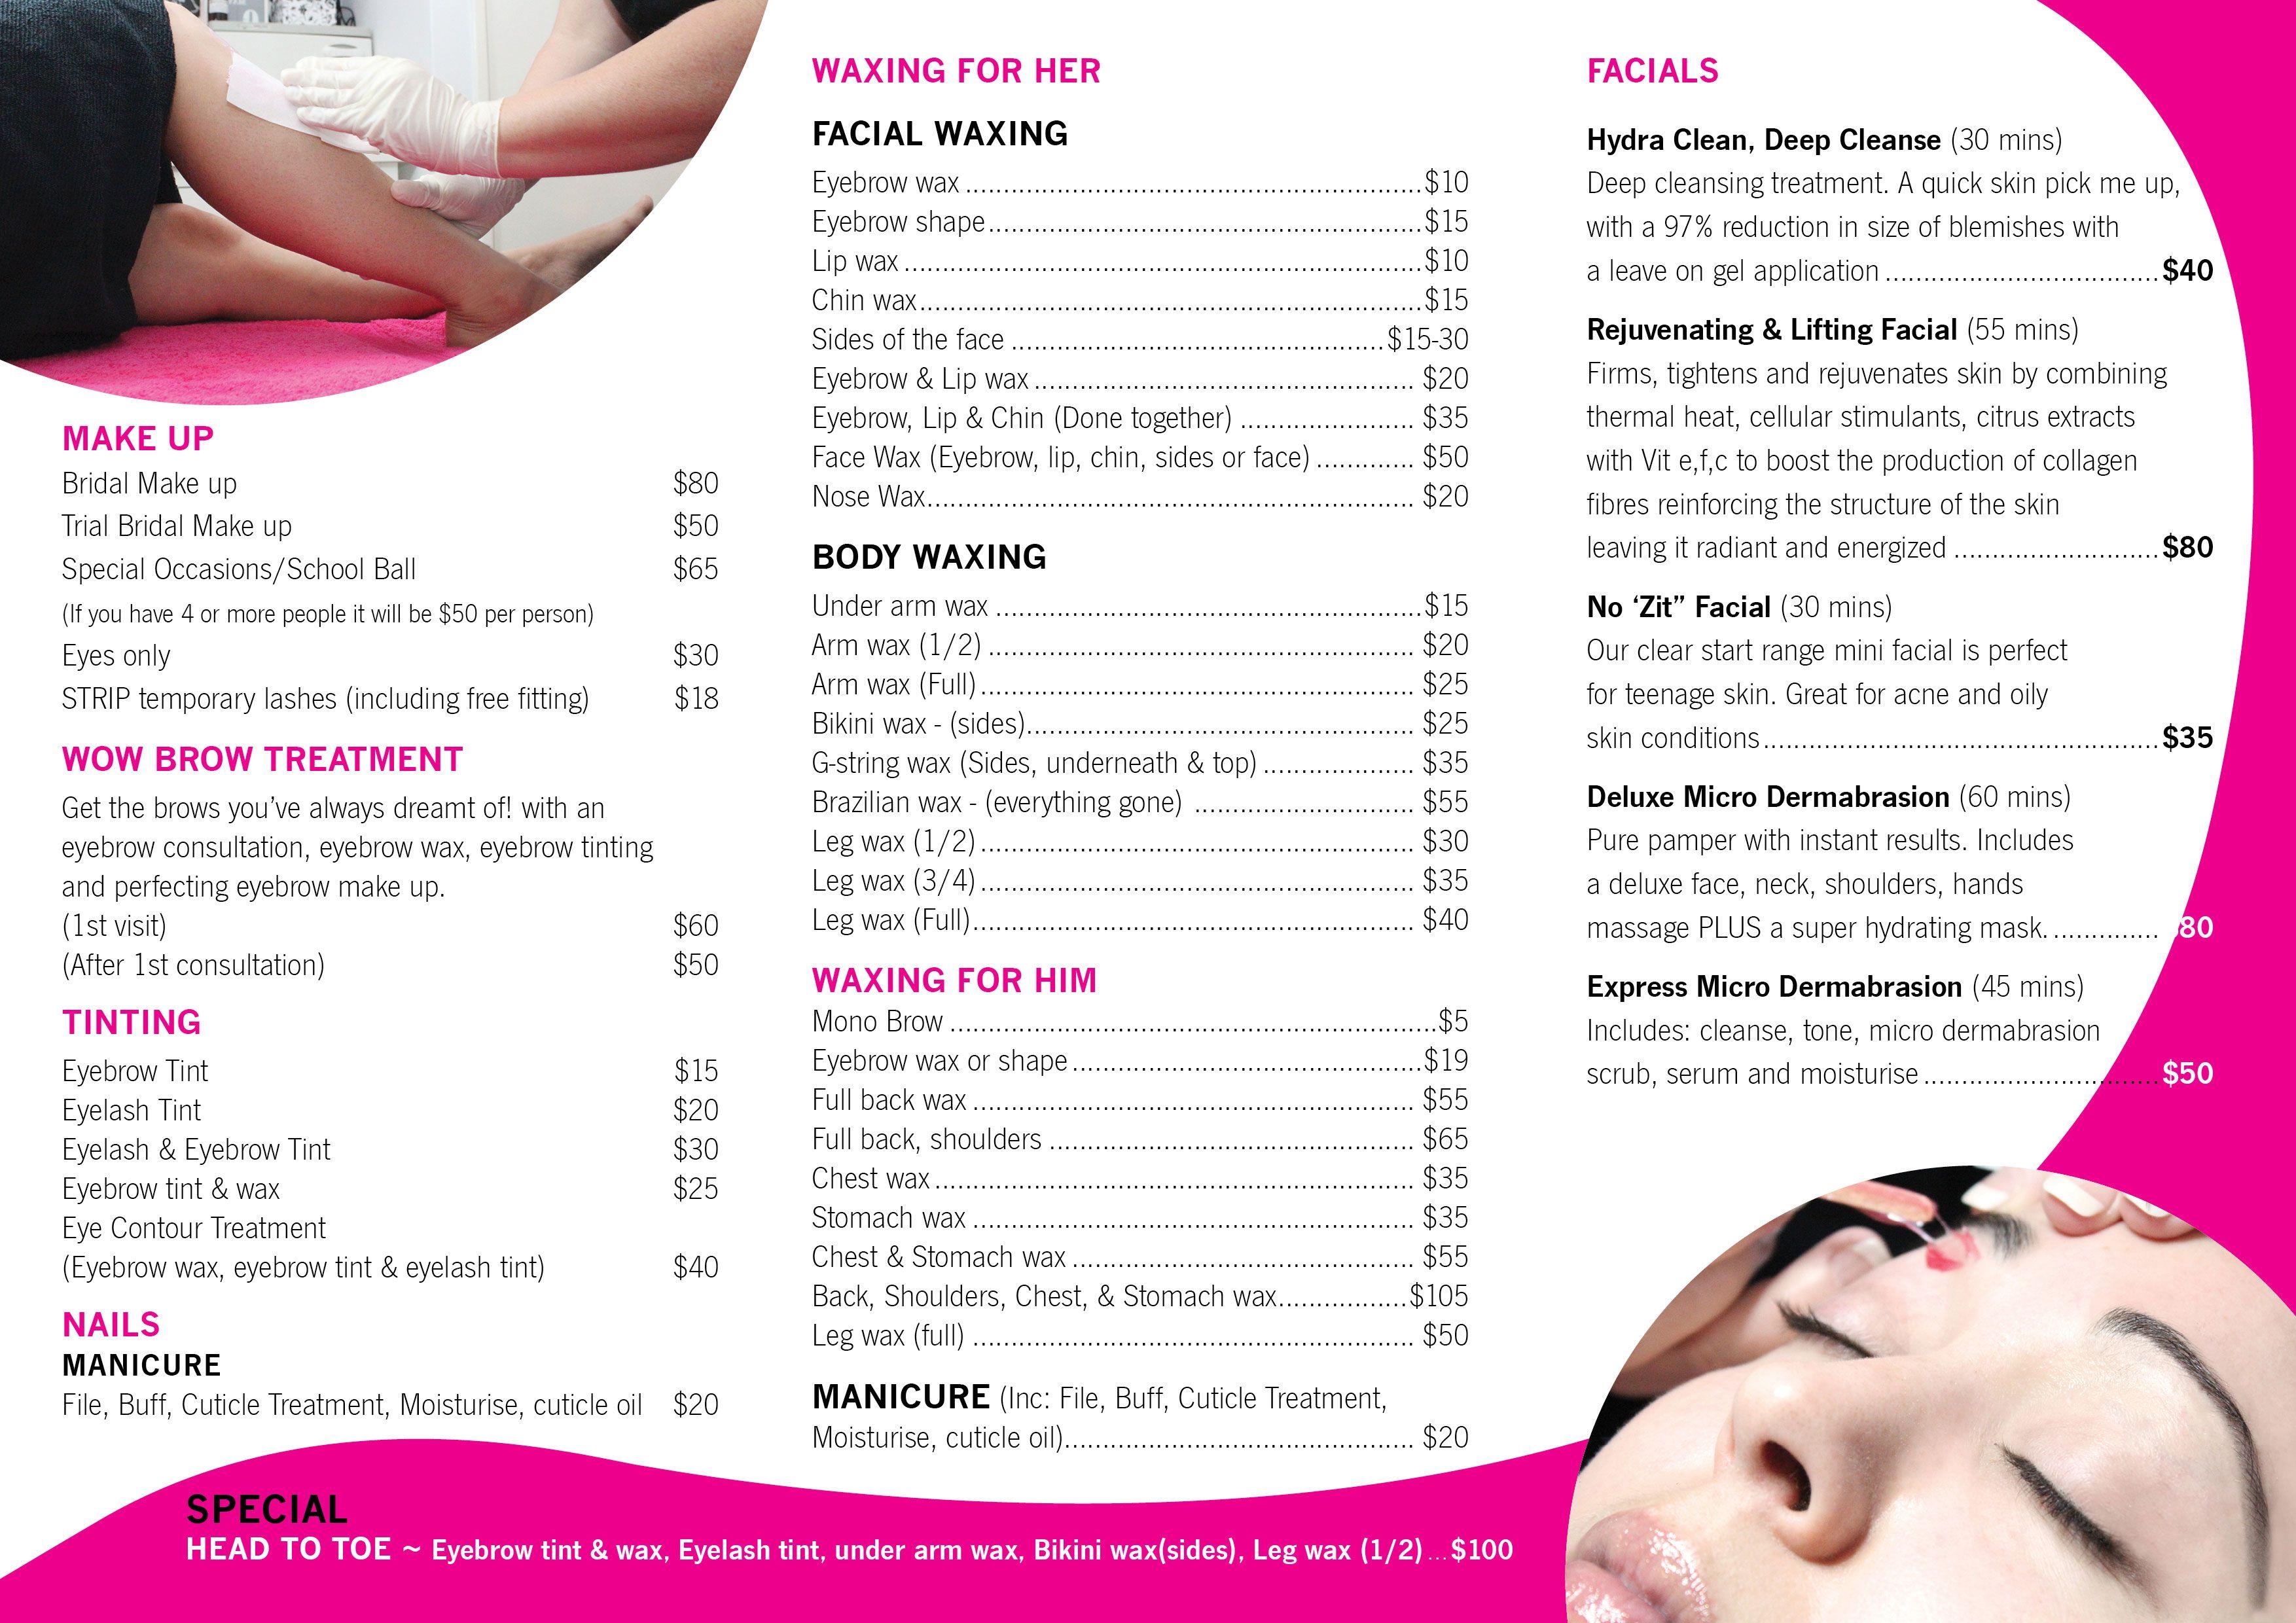 new leaflet for trish u0026 39 s beauty salon  inside